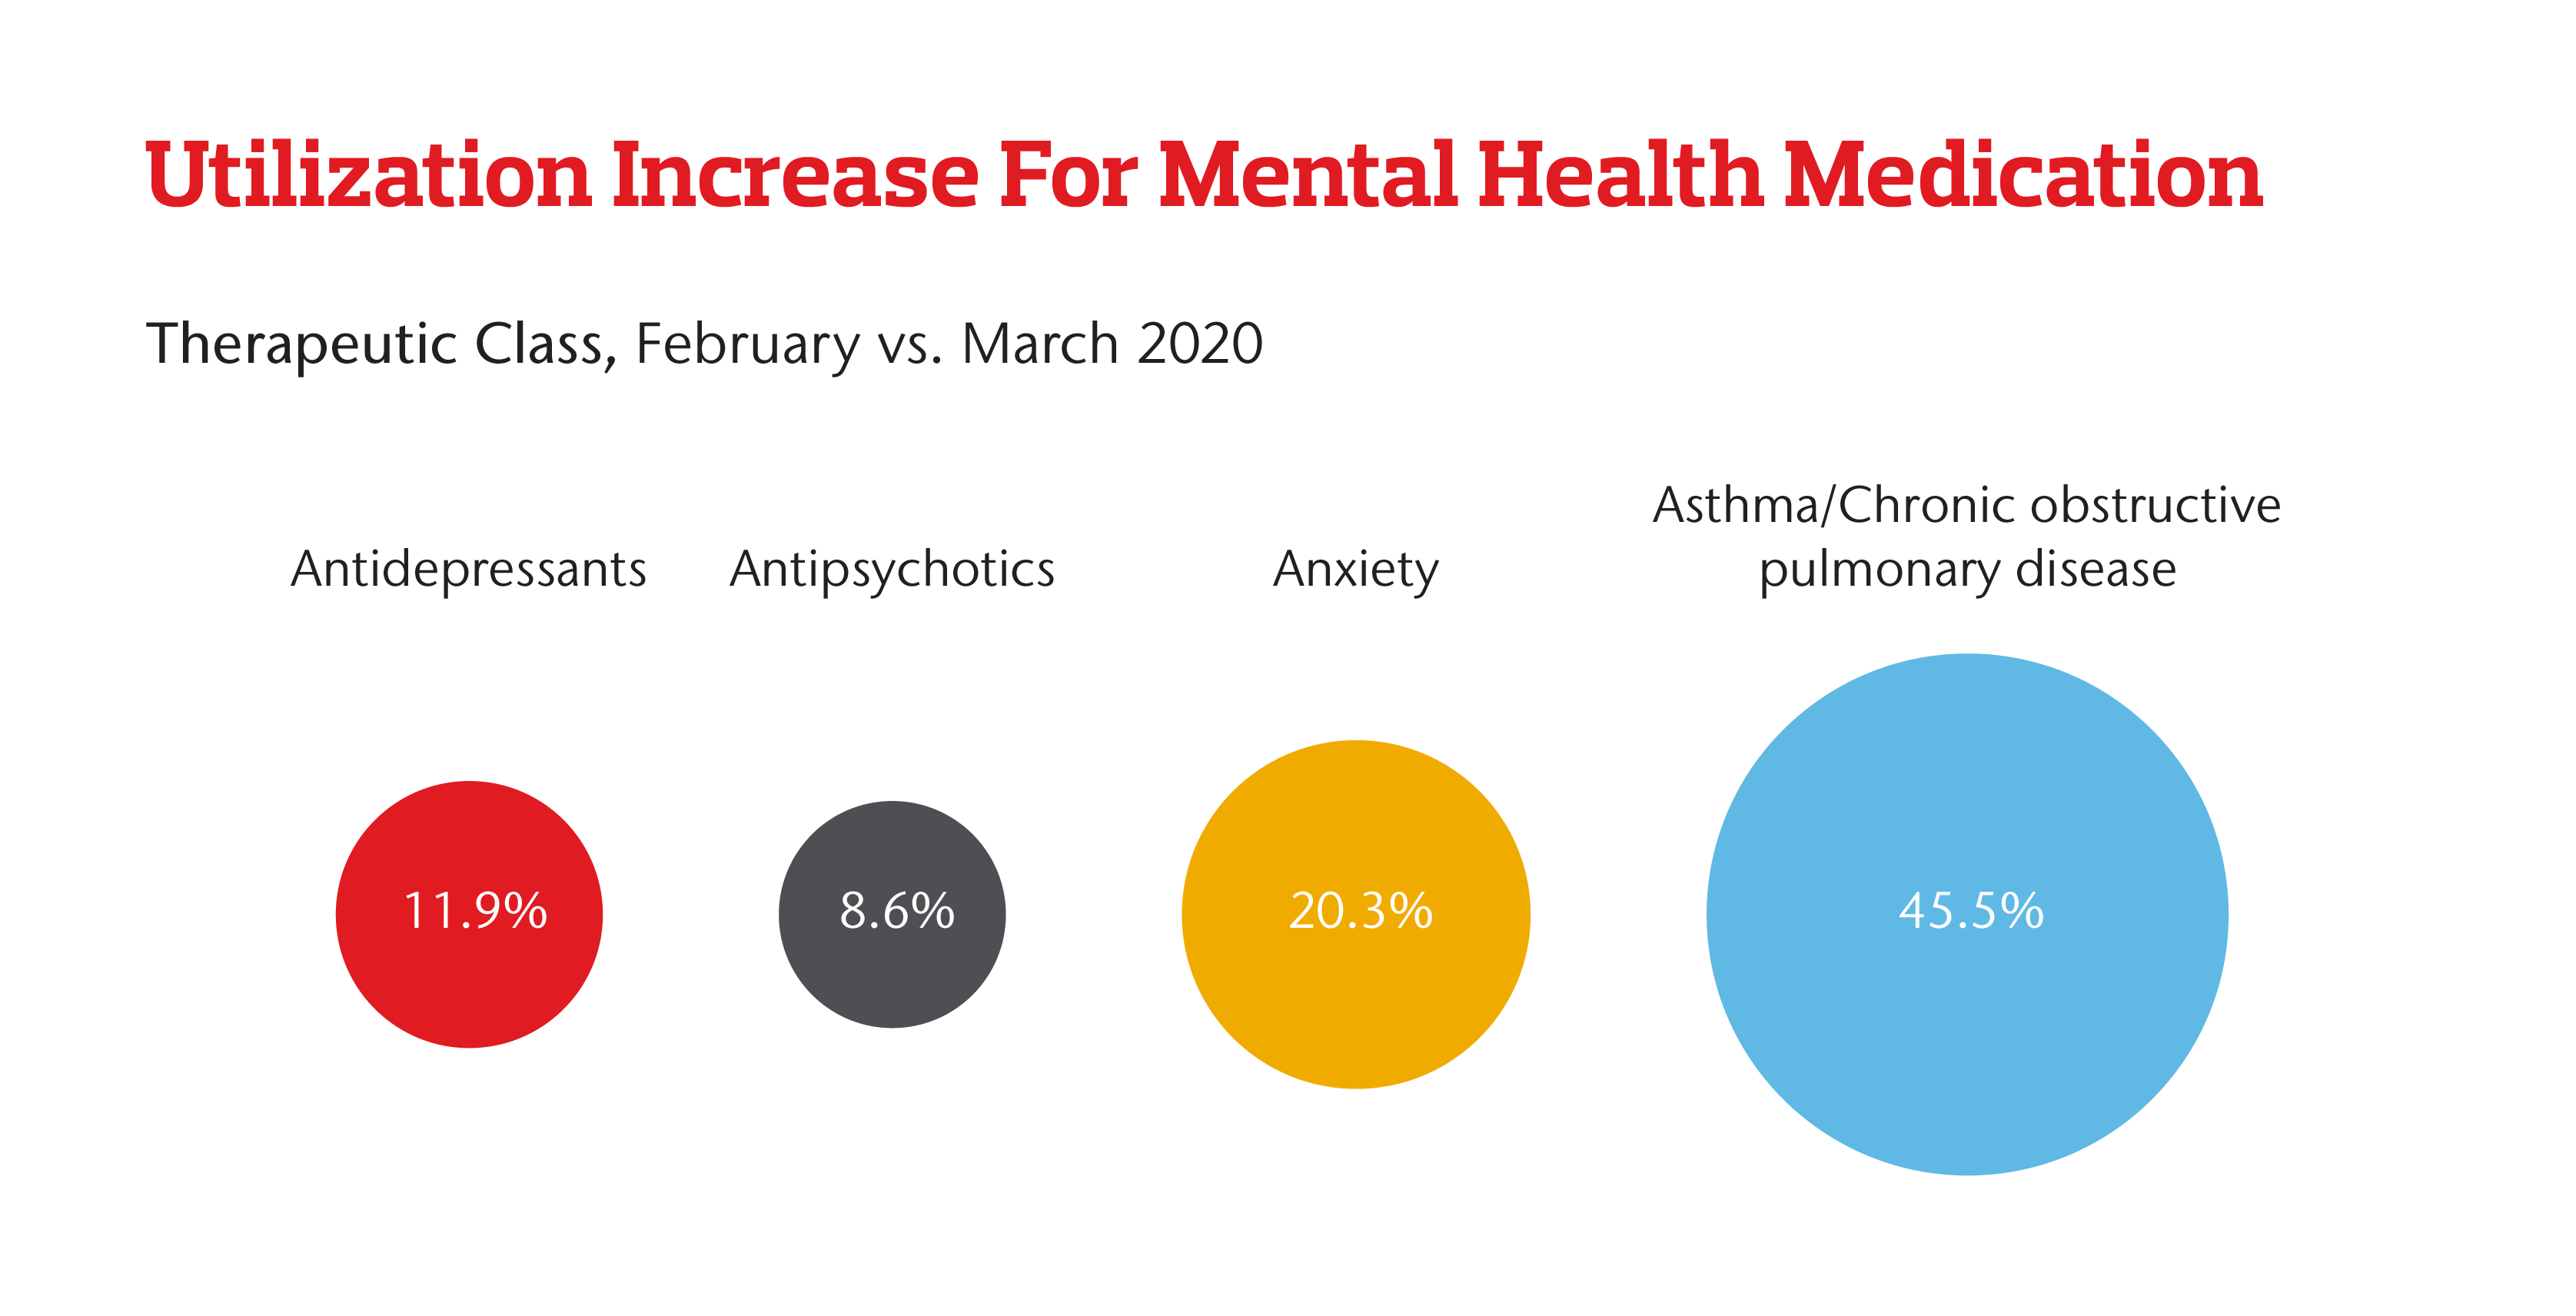 Utilization Increase for Mental Health Medication